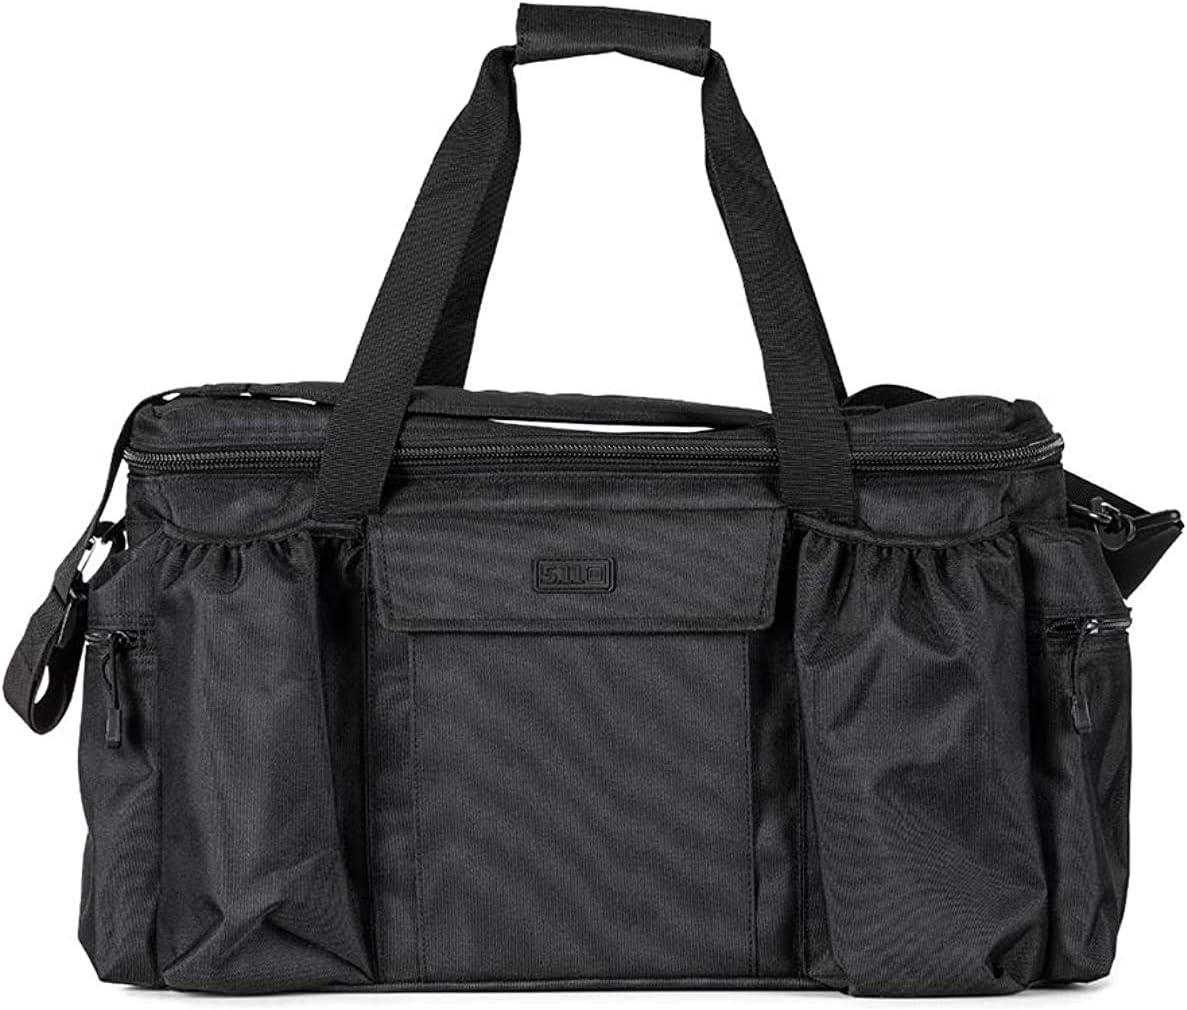 5.11 Tactical 5902 - Bolsa Patrol Ready, Negra